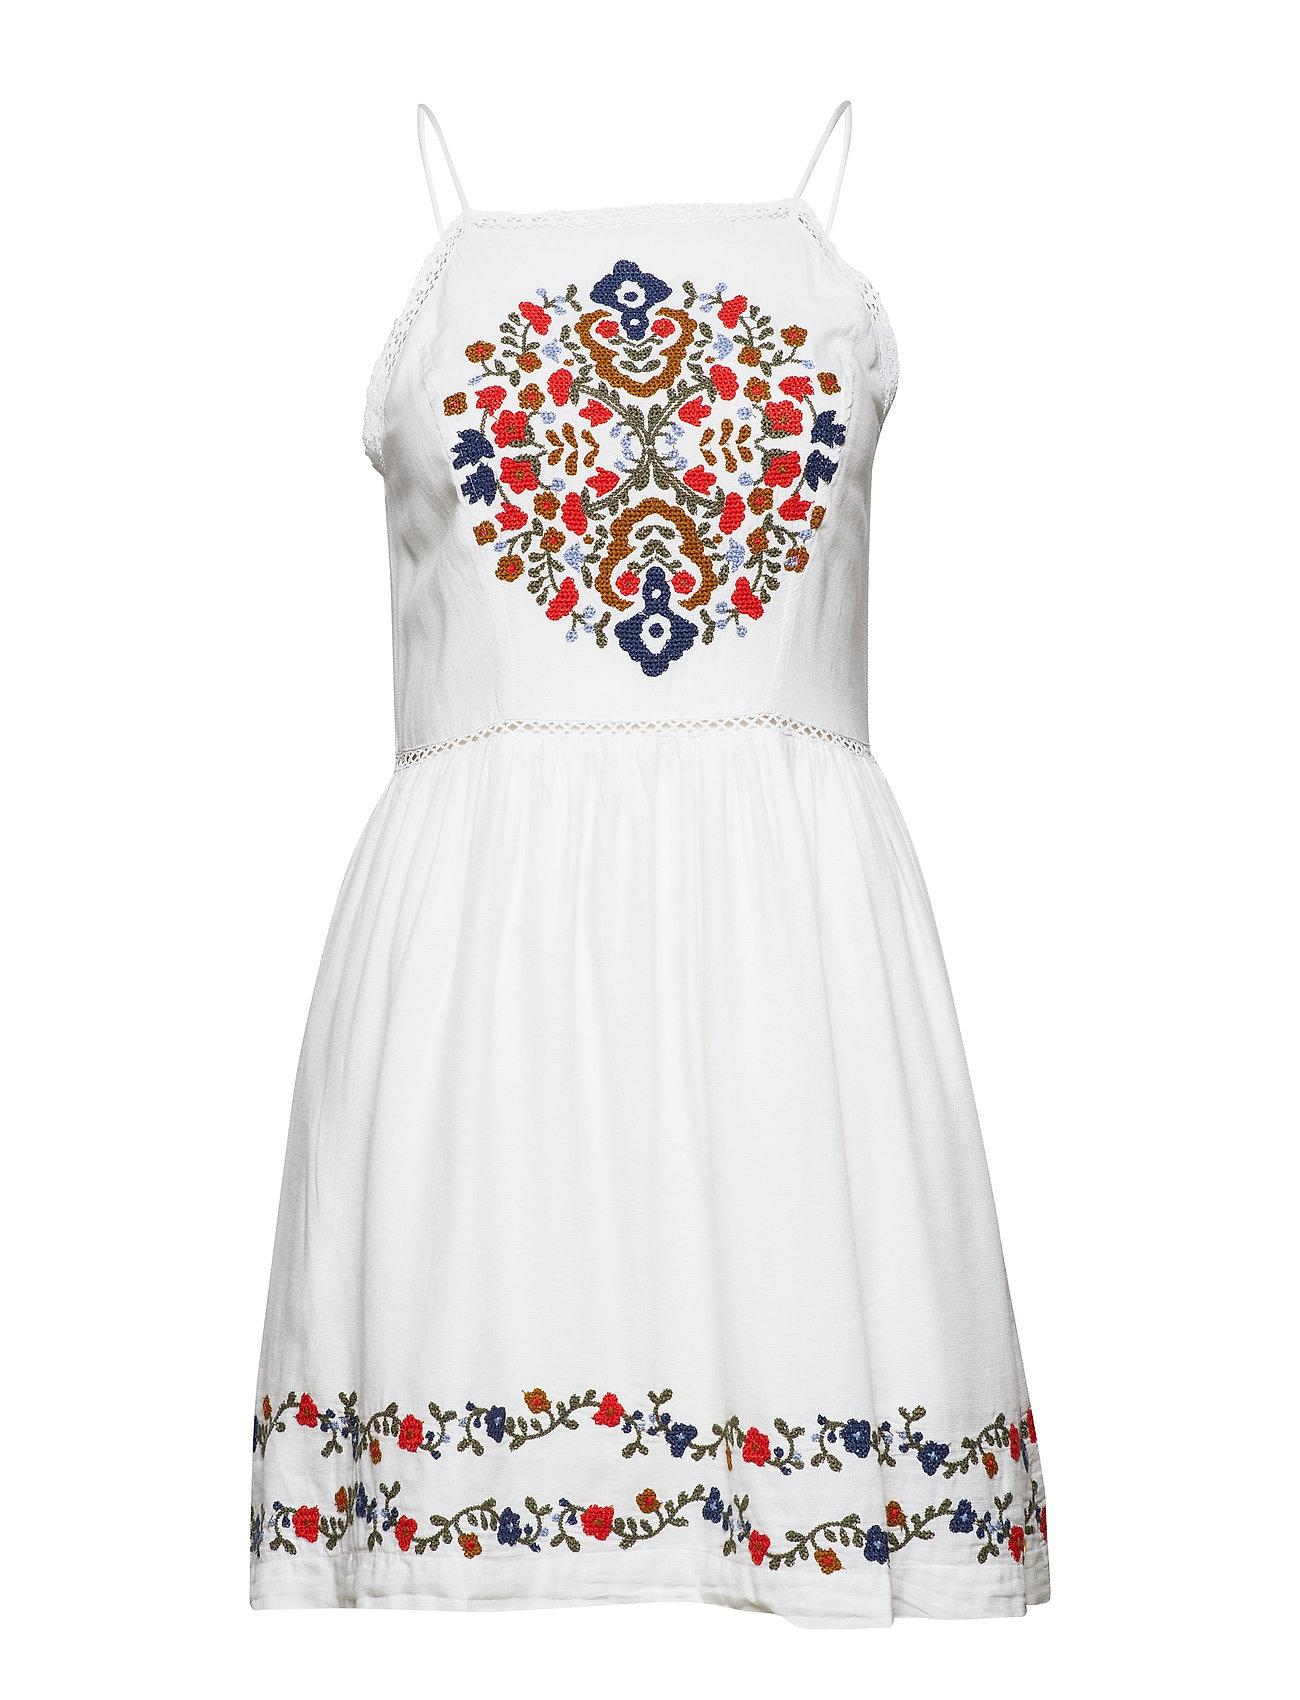 Superdry KATALINA APRON DRESS - WHITE MULTI